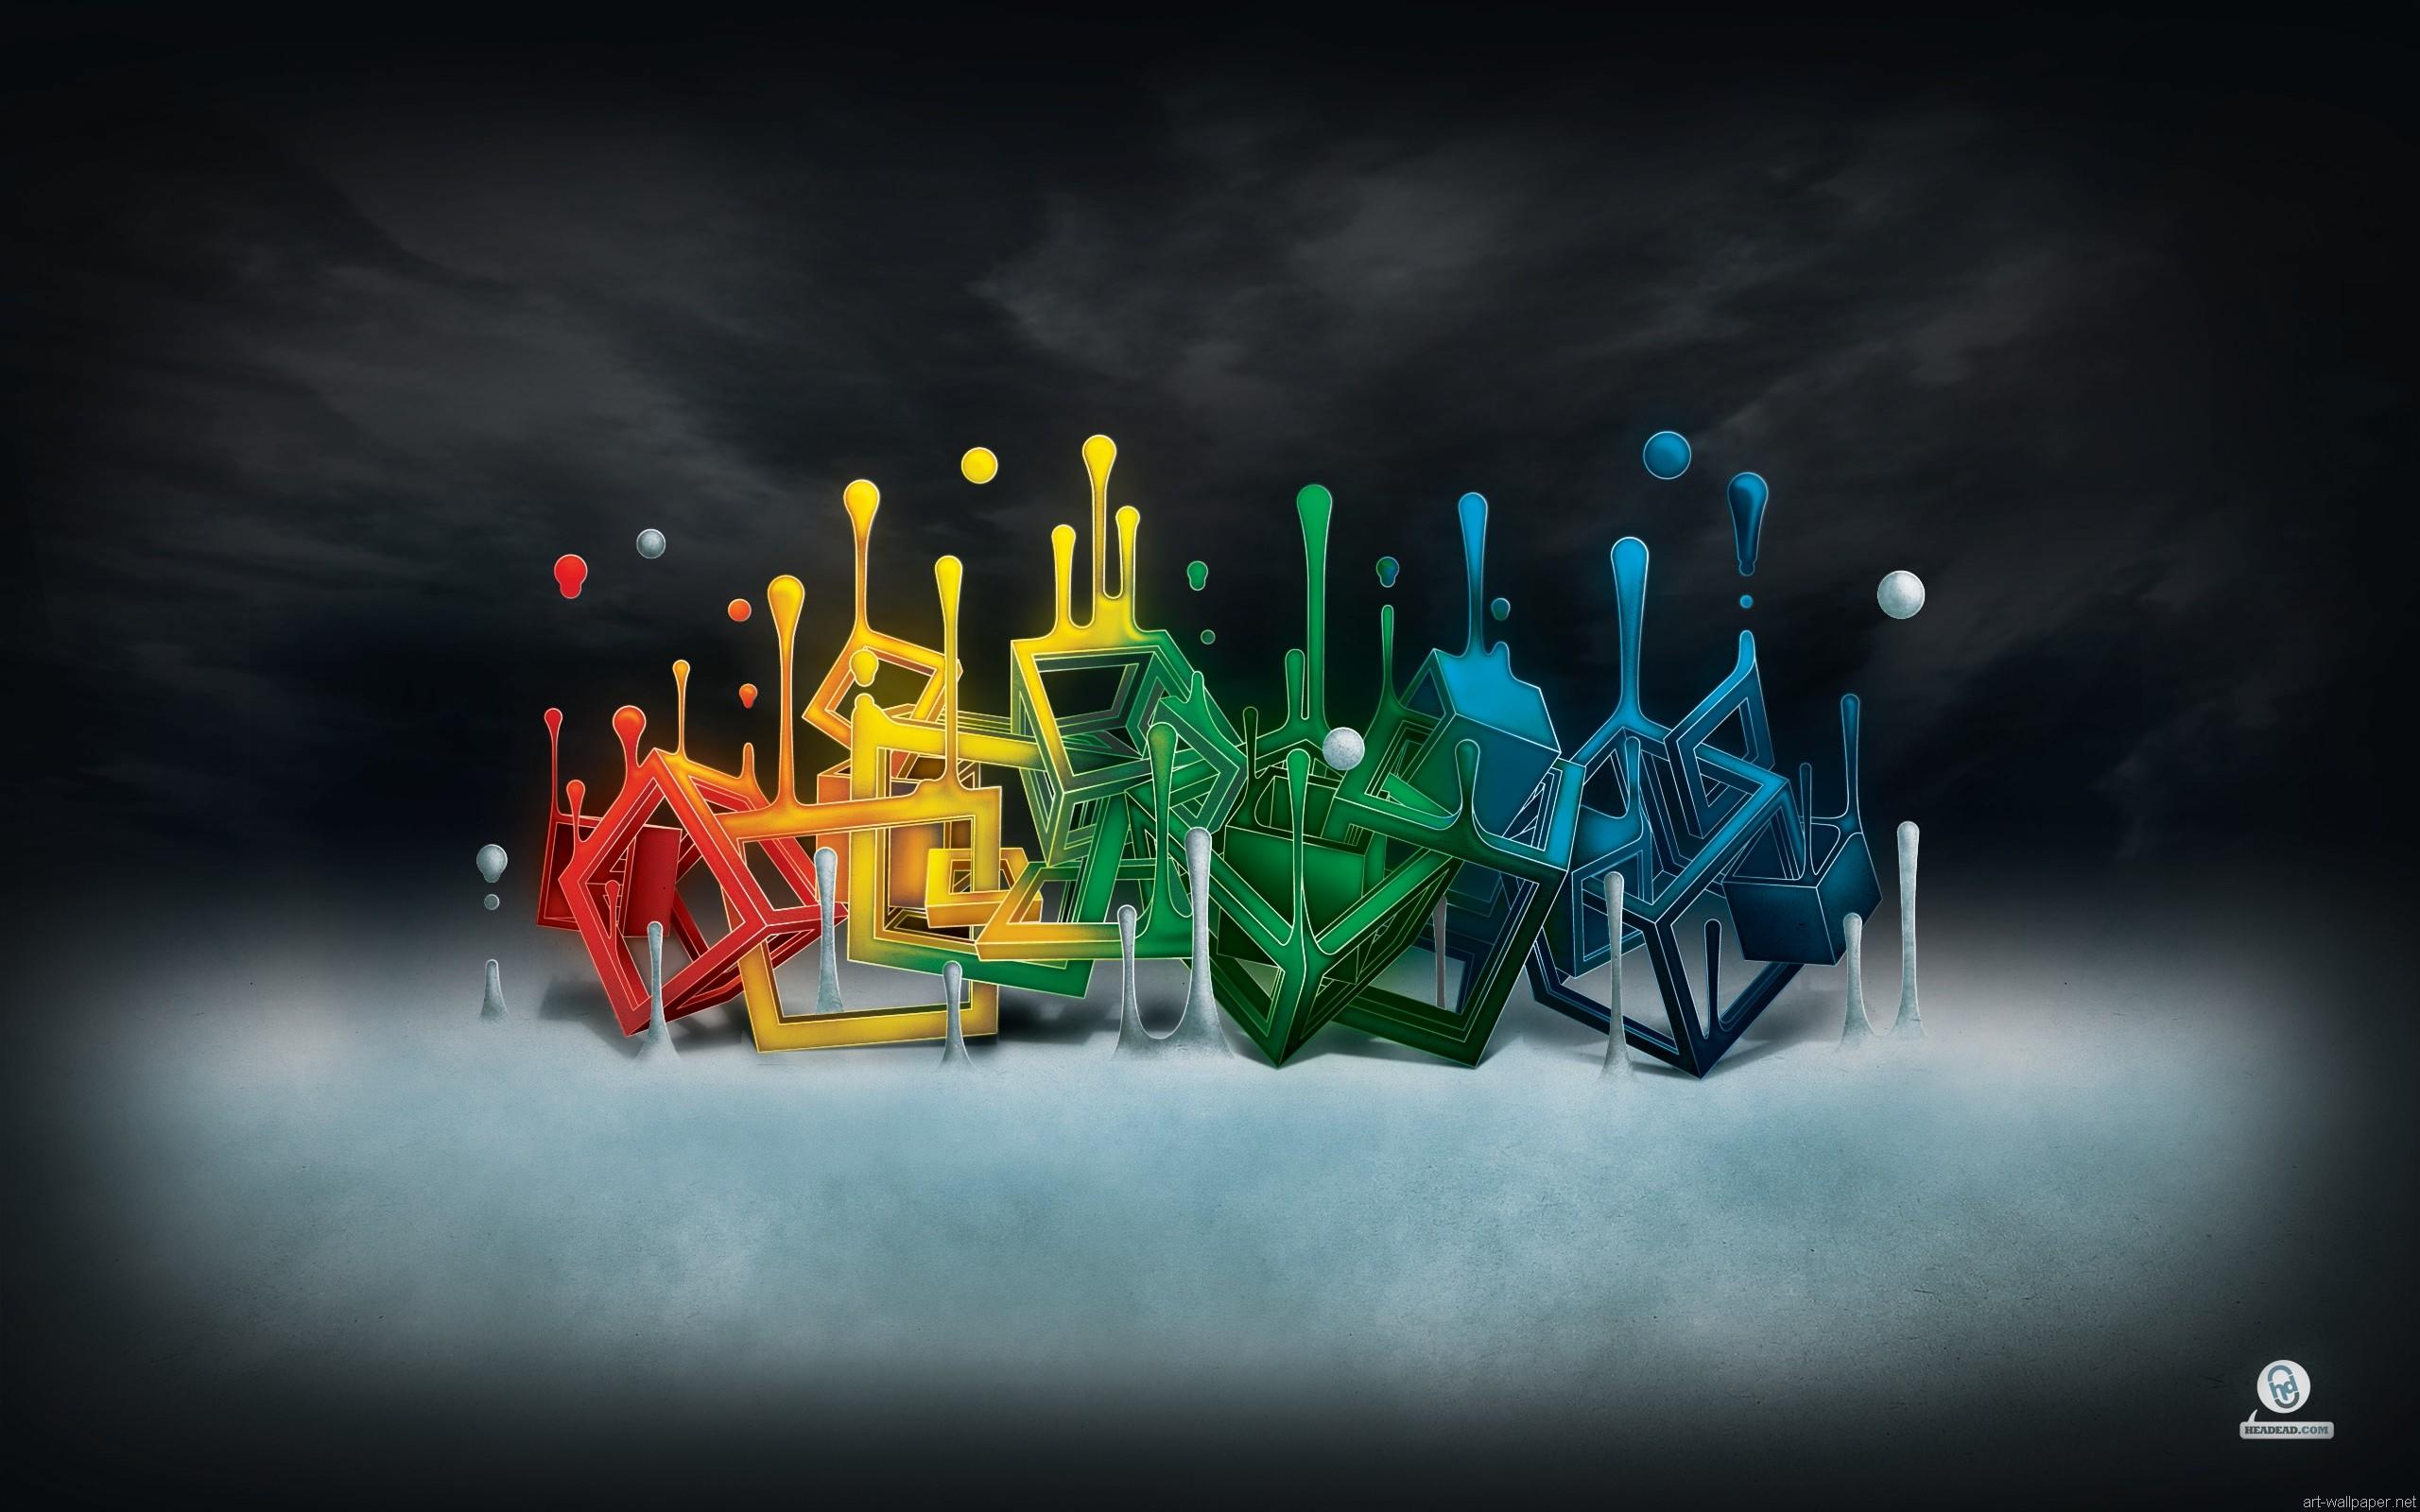 colorful art wallpaper hd